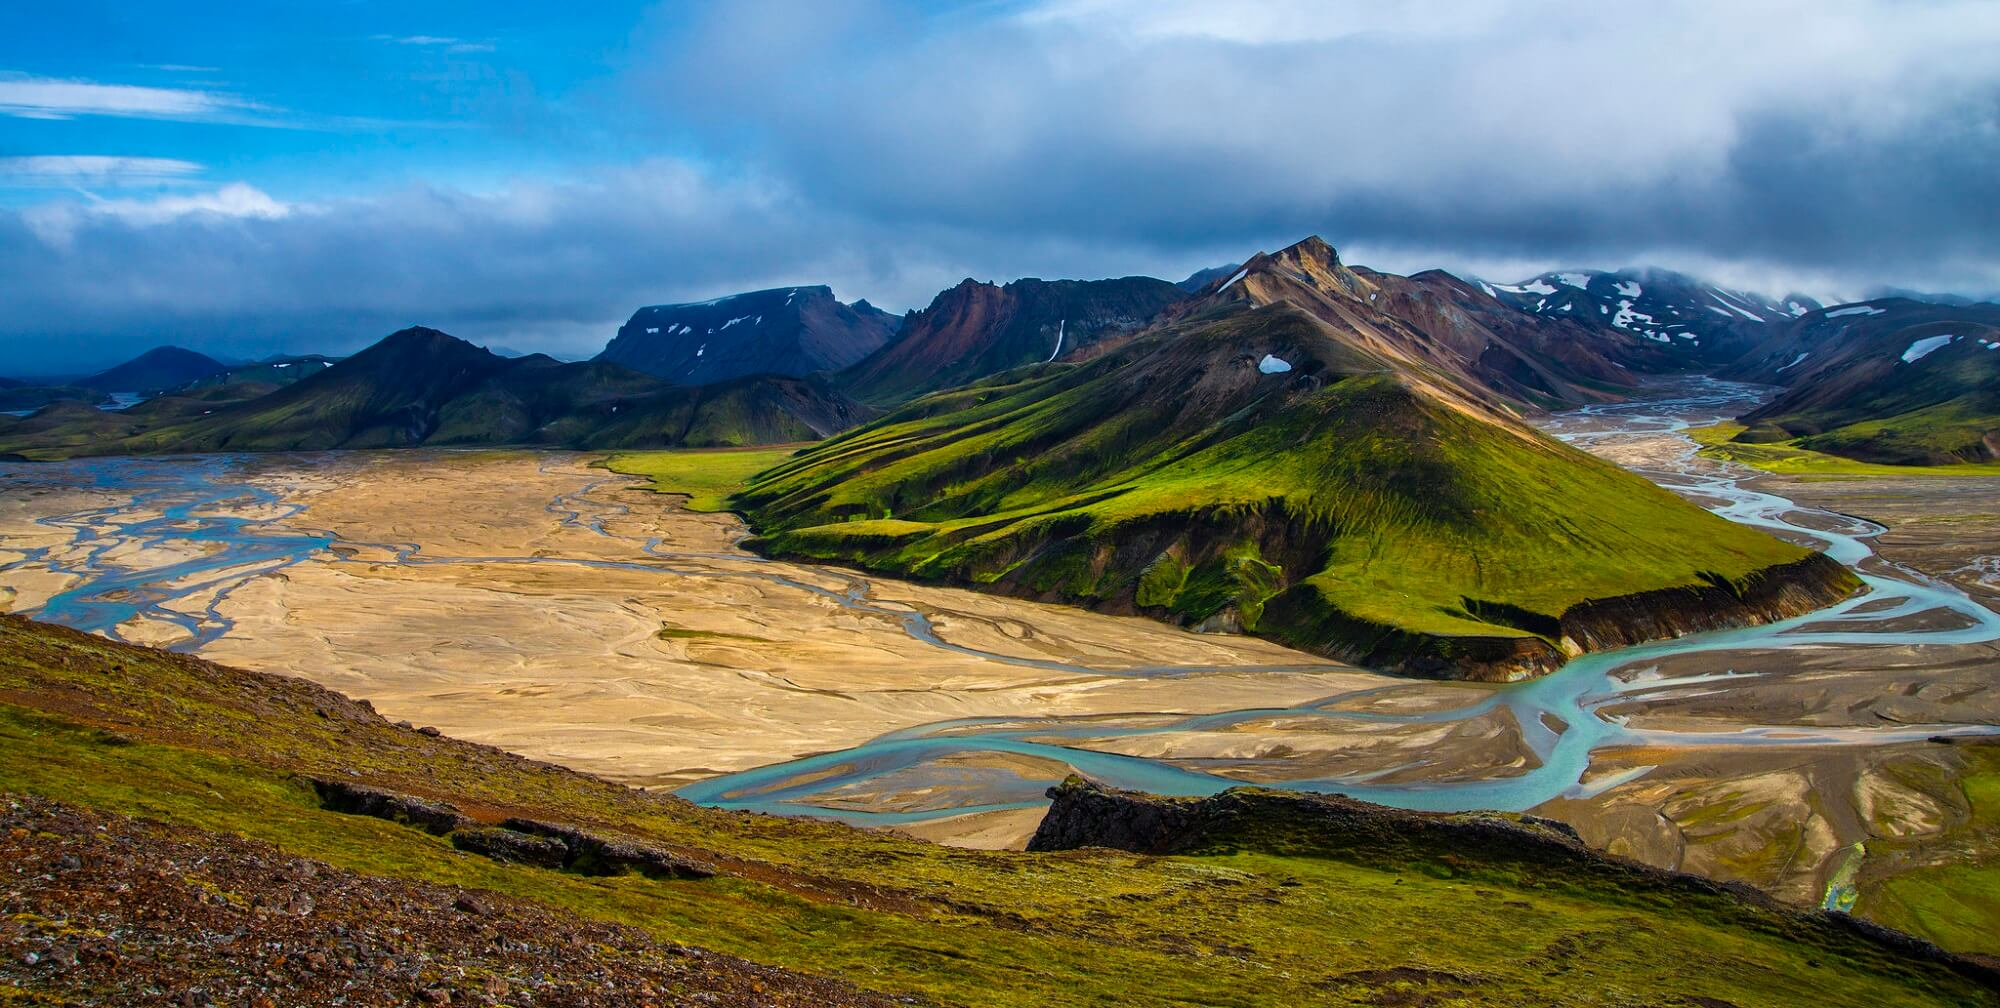 Getting To Landmannalaugar By Car